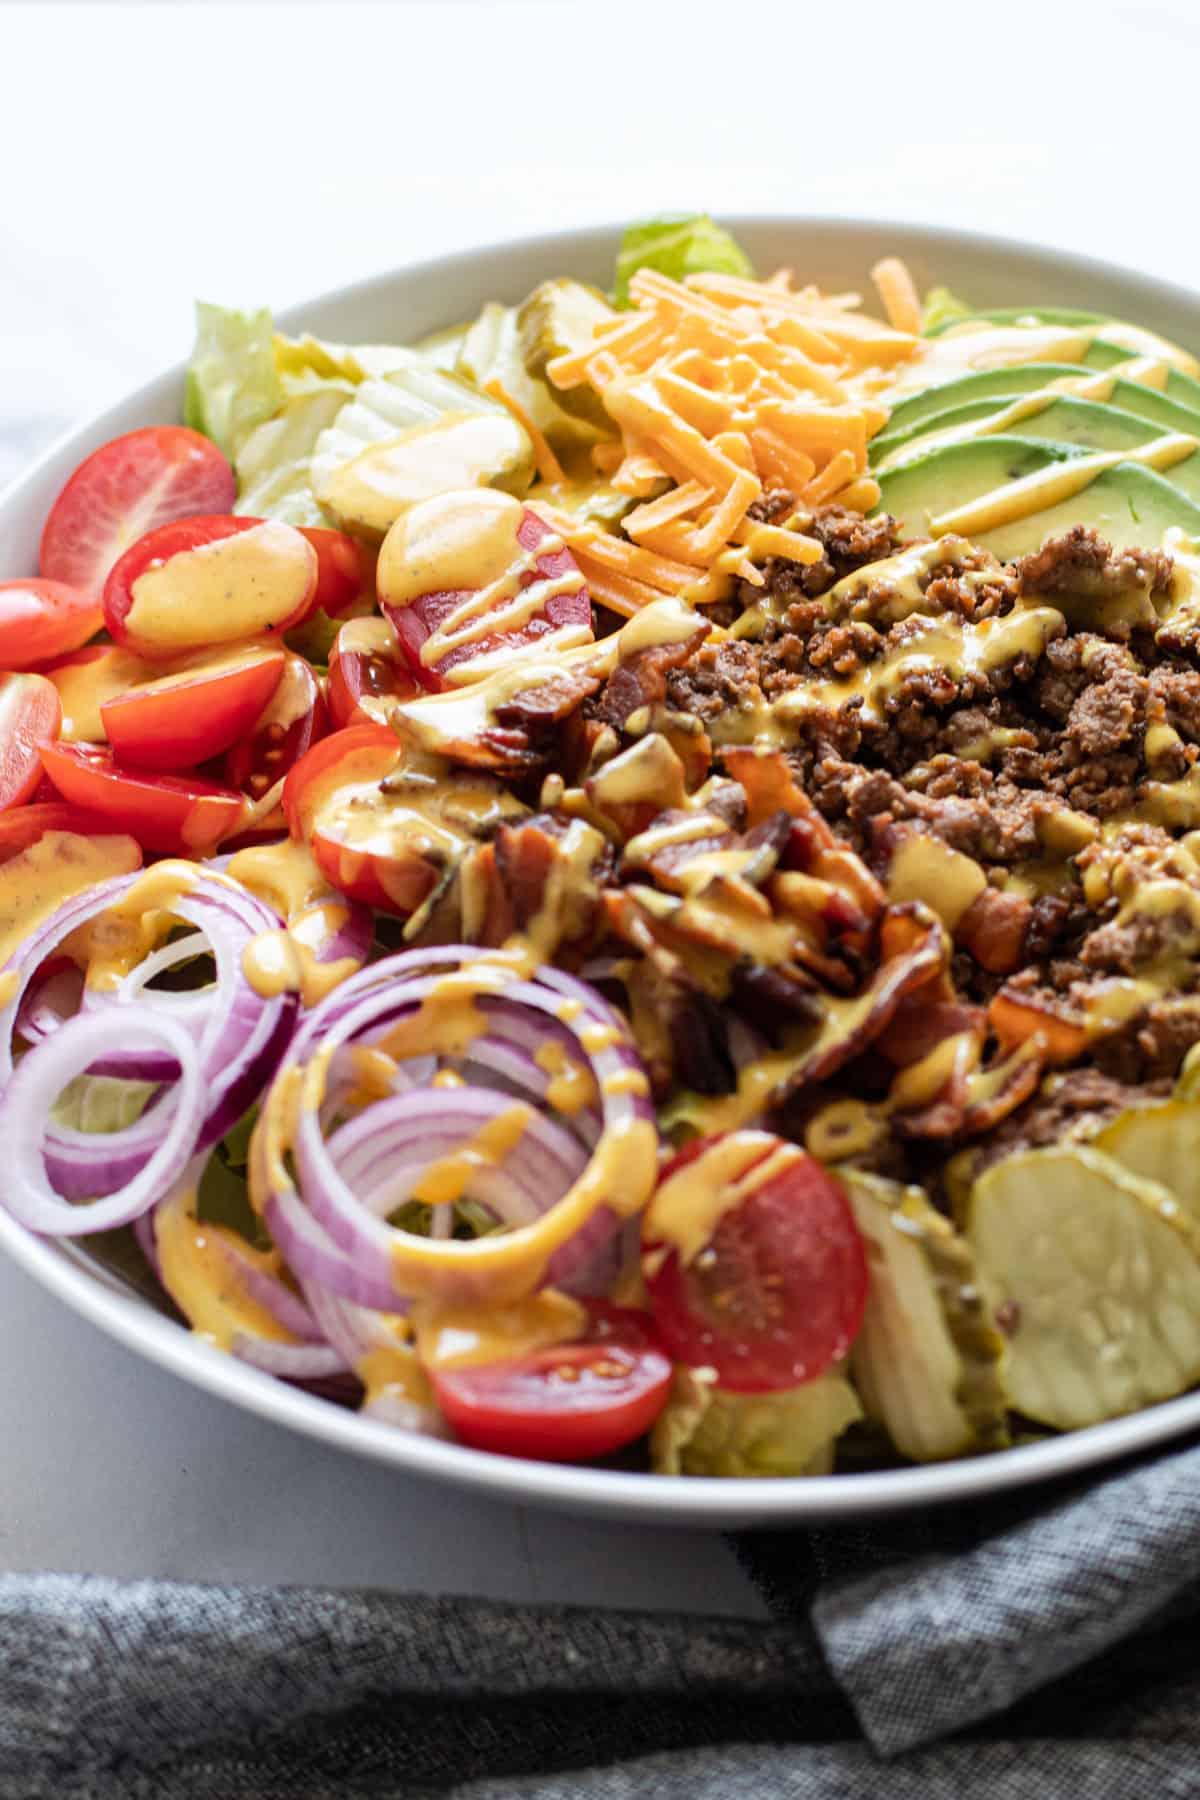 A cheeseburger salad with mustard dressing.